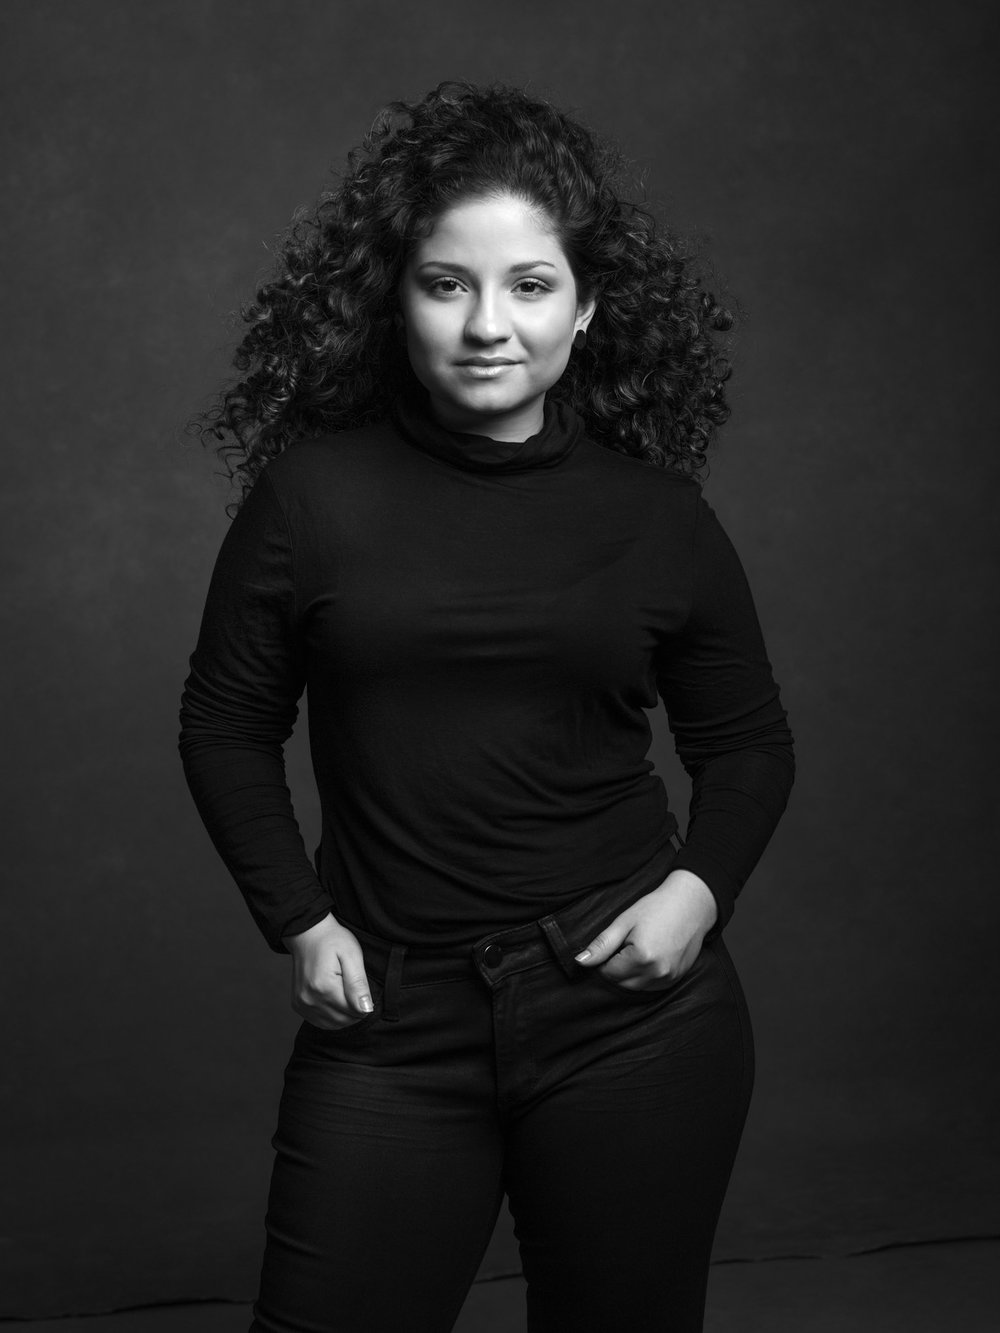 Karla Diaz-179B&W.jpg